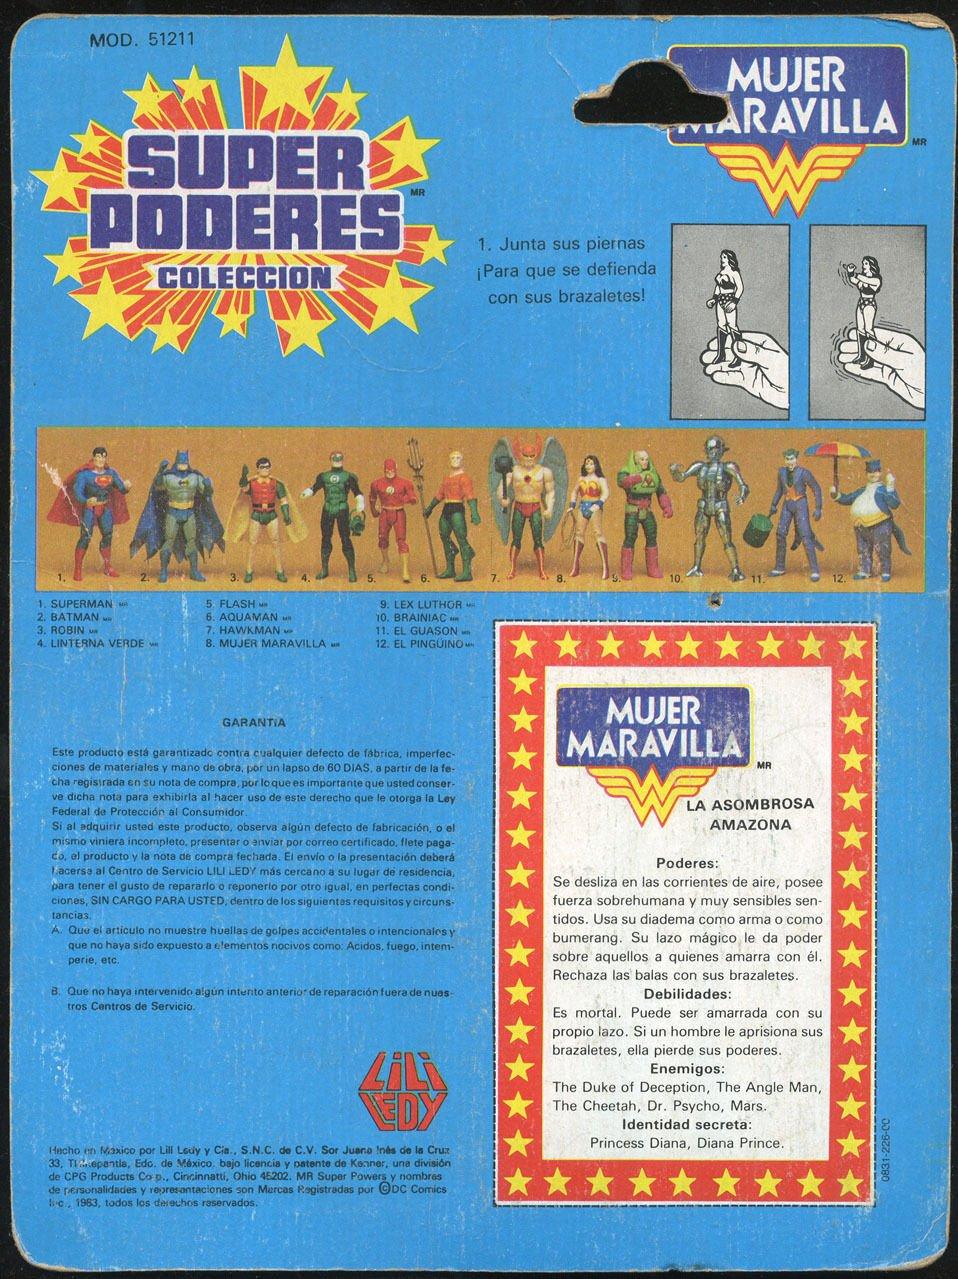 Amazon.com: Super Powers Lili Ledy Wonder Woman Backer Card Comic Rare: Entertainment Collectibles